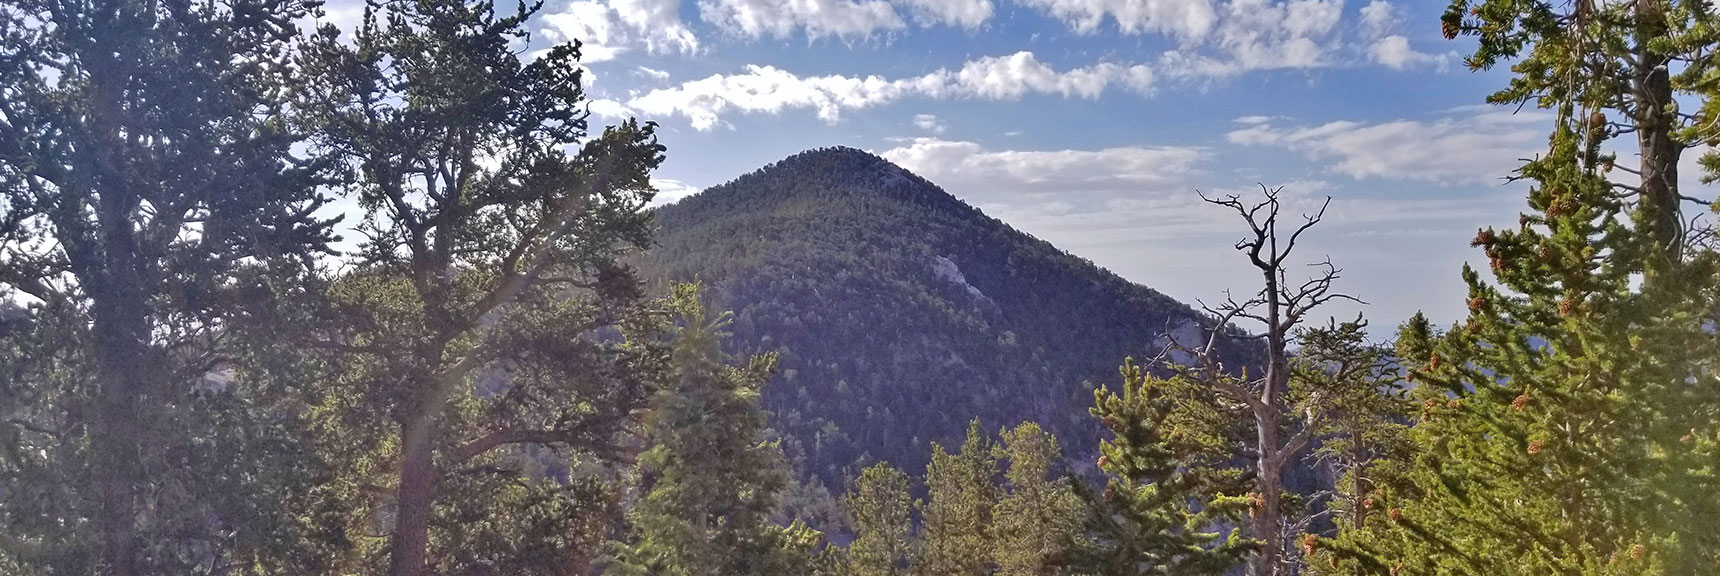 Fletcher Peak from North Loop Trail Approaching Raintree | Mummy Mountain's Knees | Mt. Charleston Wilderness, Nevada 008